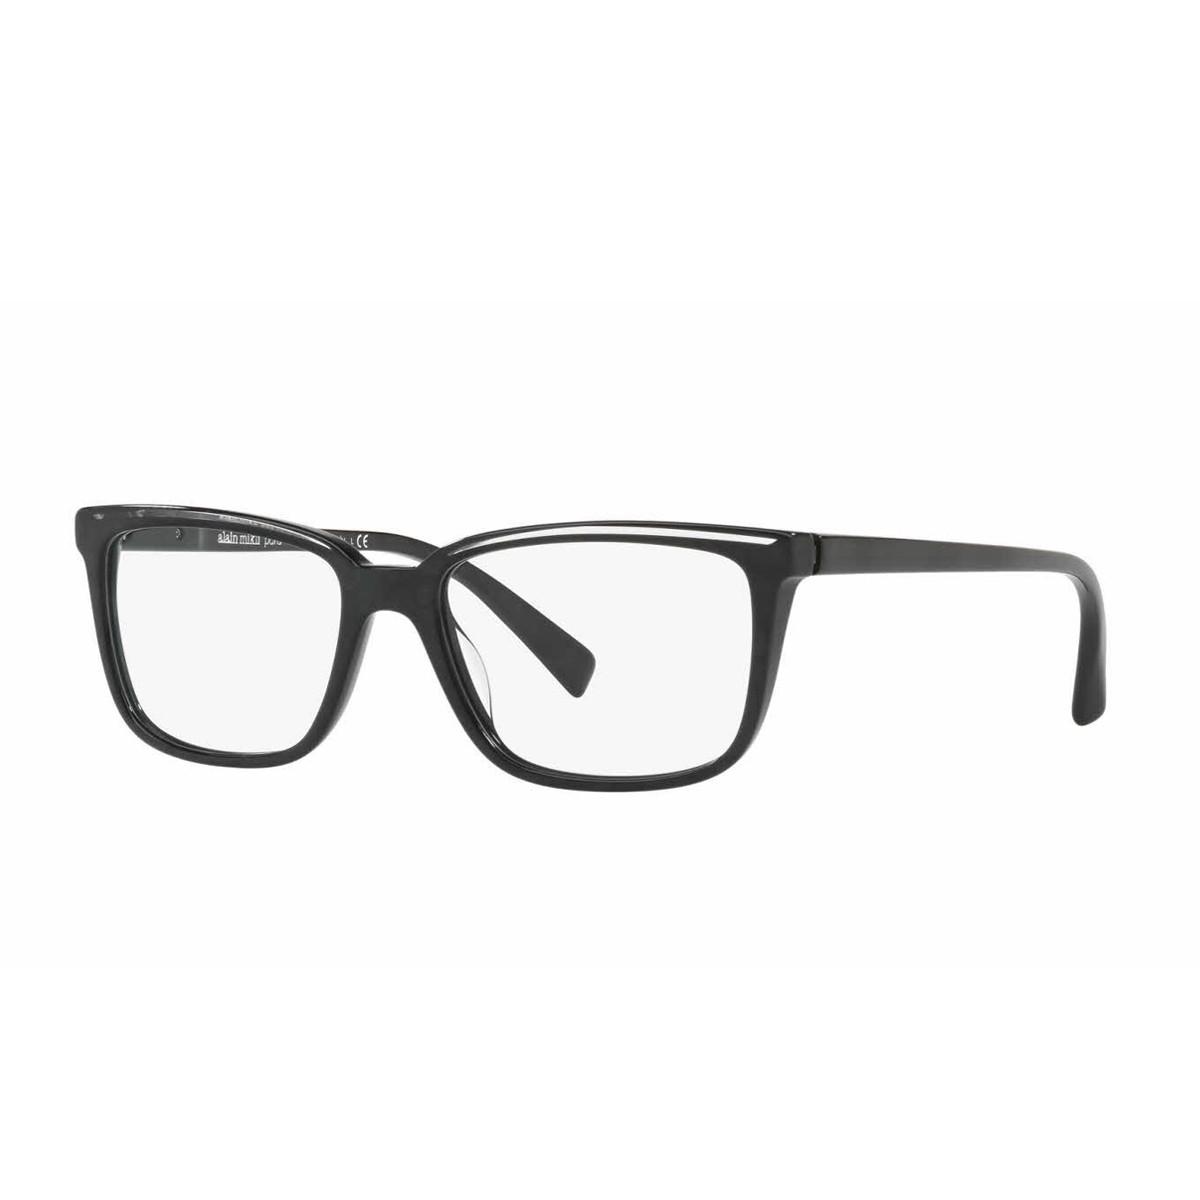 Alain Mikli A03079 | Occhiali da vista Uomo